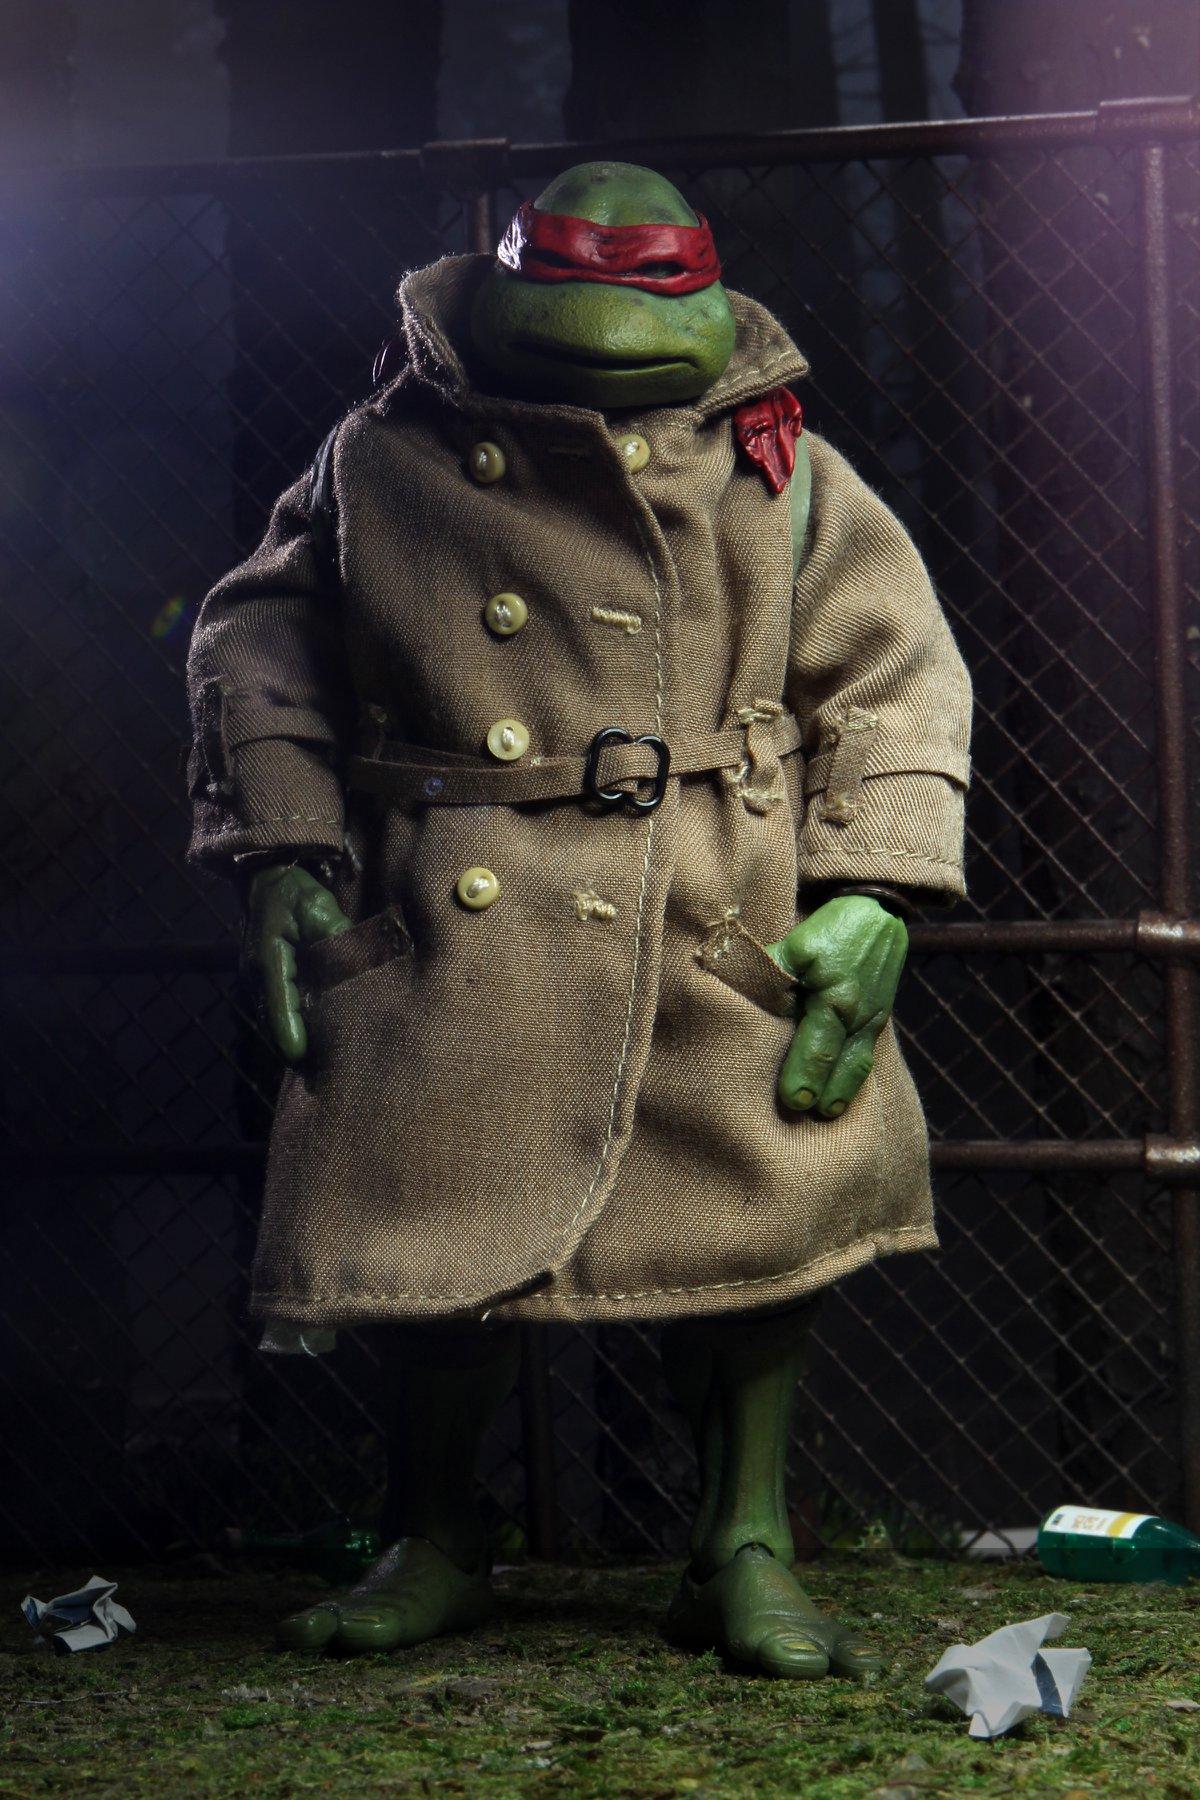 Link a teenage mutant ninja turtles – NECA – action – figure – tartarughe ninja – raffaello – casey jones – 13